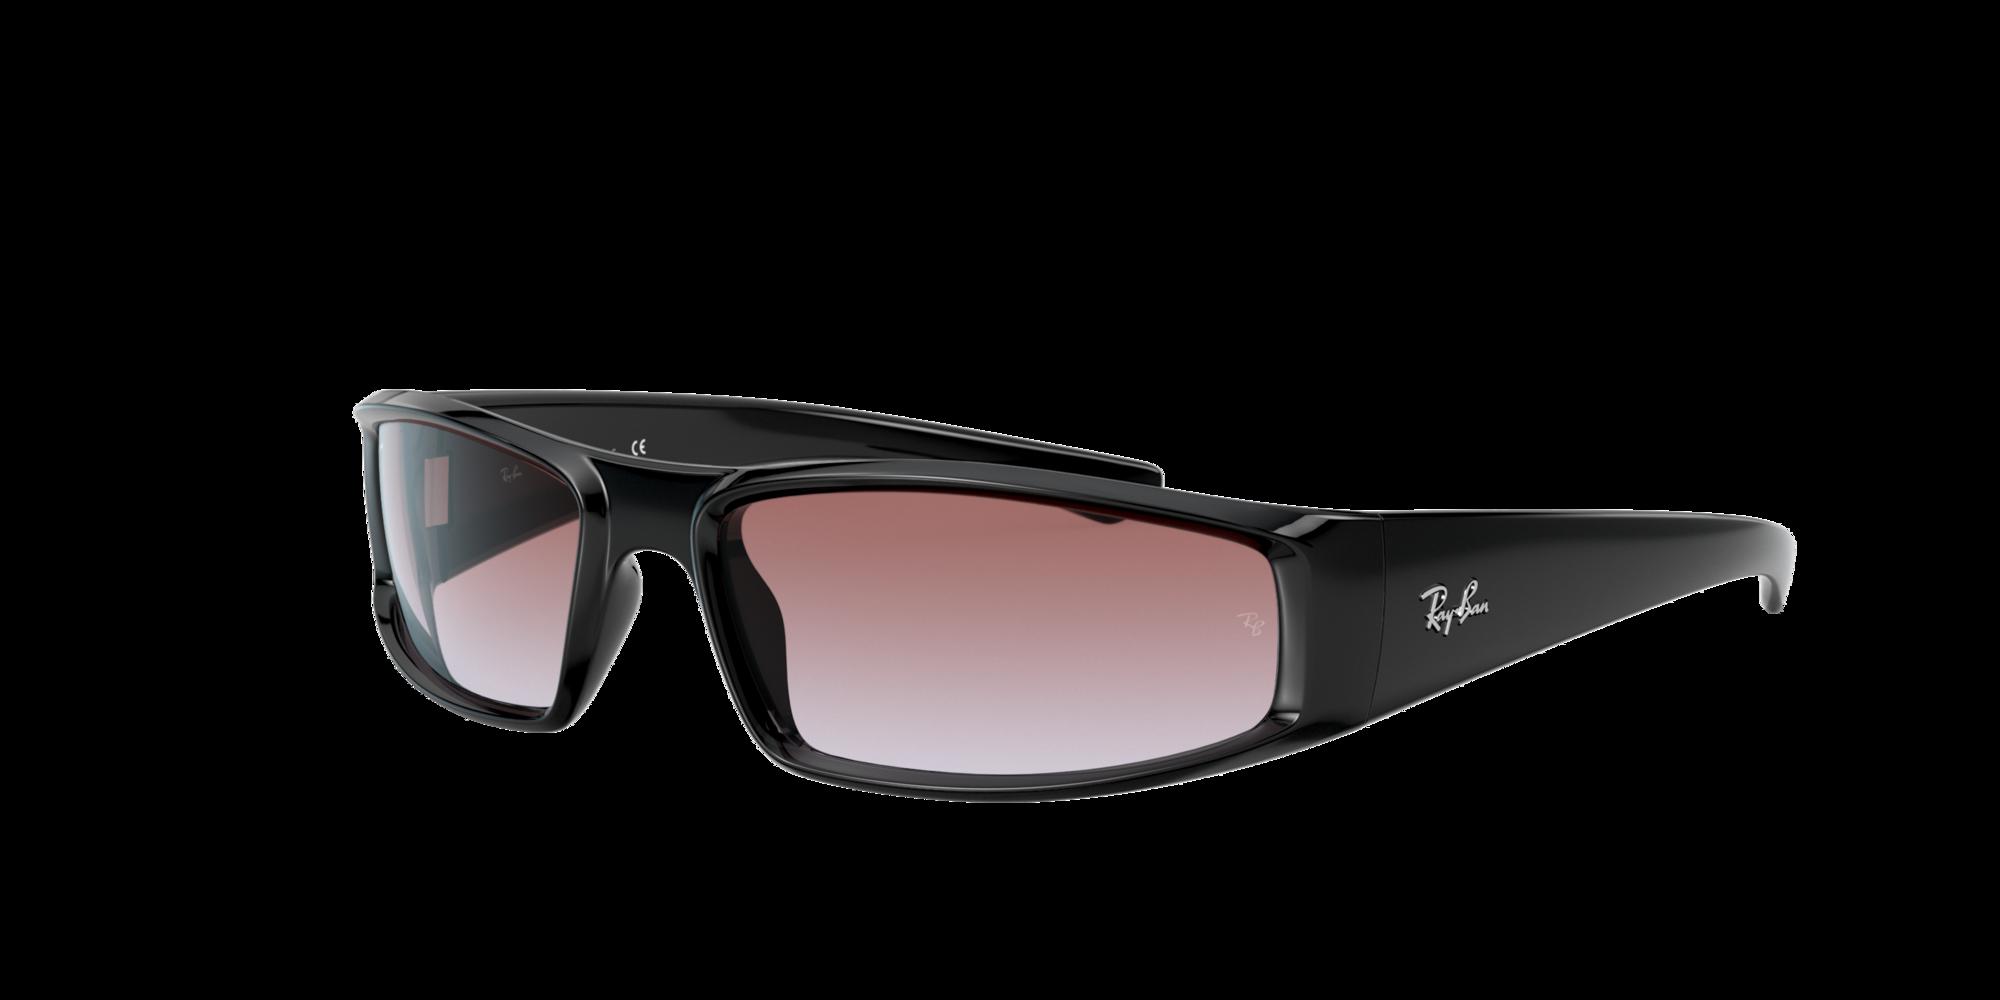 Ray Ban Unisex  RB4335 -  Frame color: Negro, Lens color: Violeta, Size 58-17/130